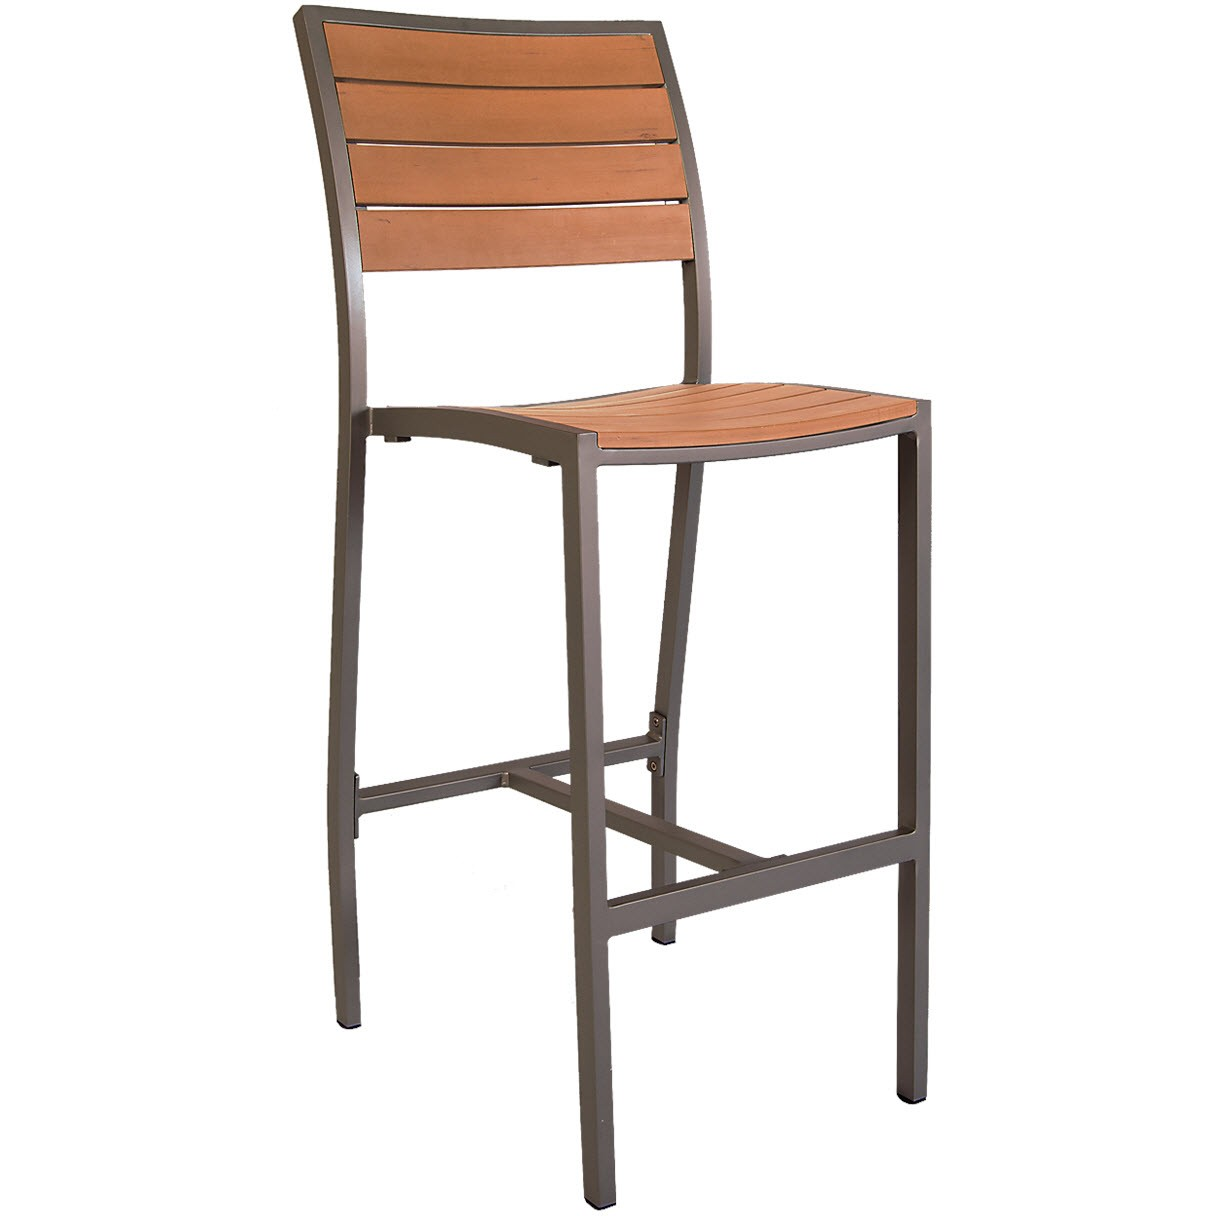 aluminum rust colored patio bar stool with plastic teak. Black Bedroom Furniture Sets. Home Design Ideas